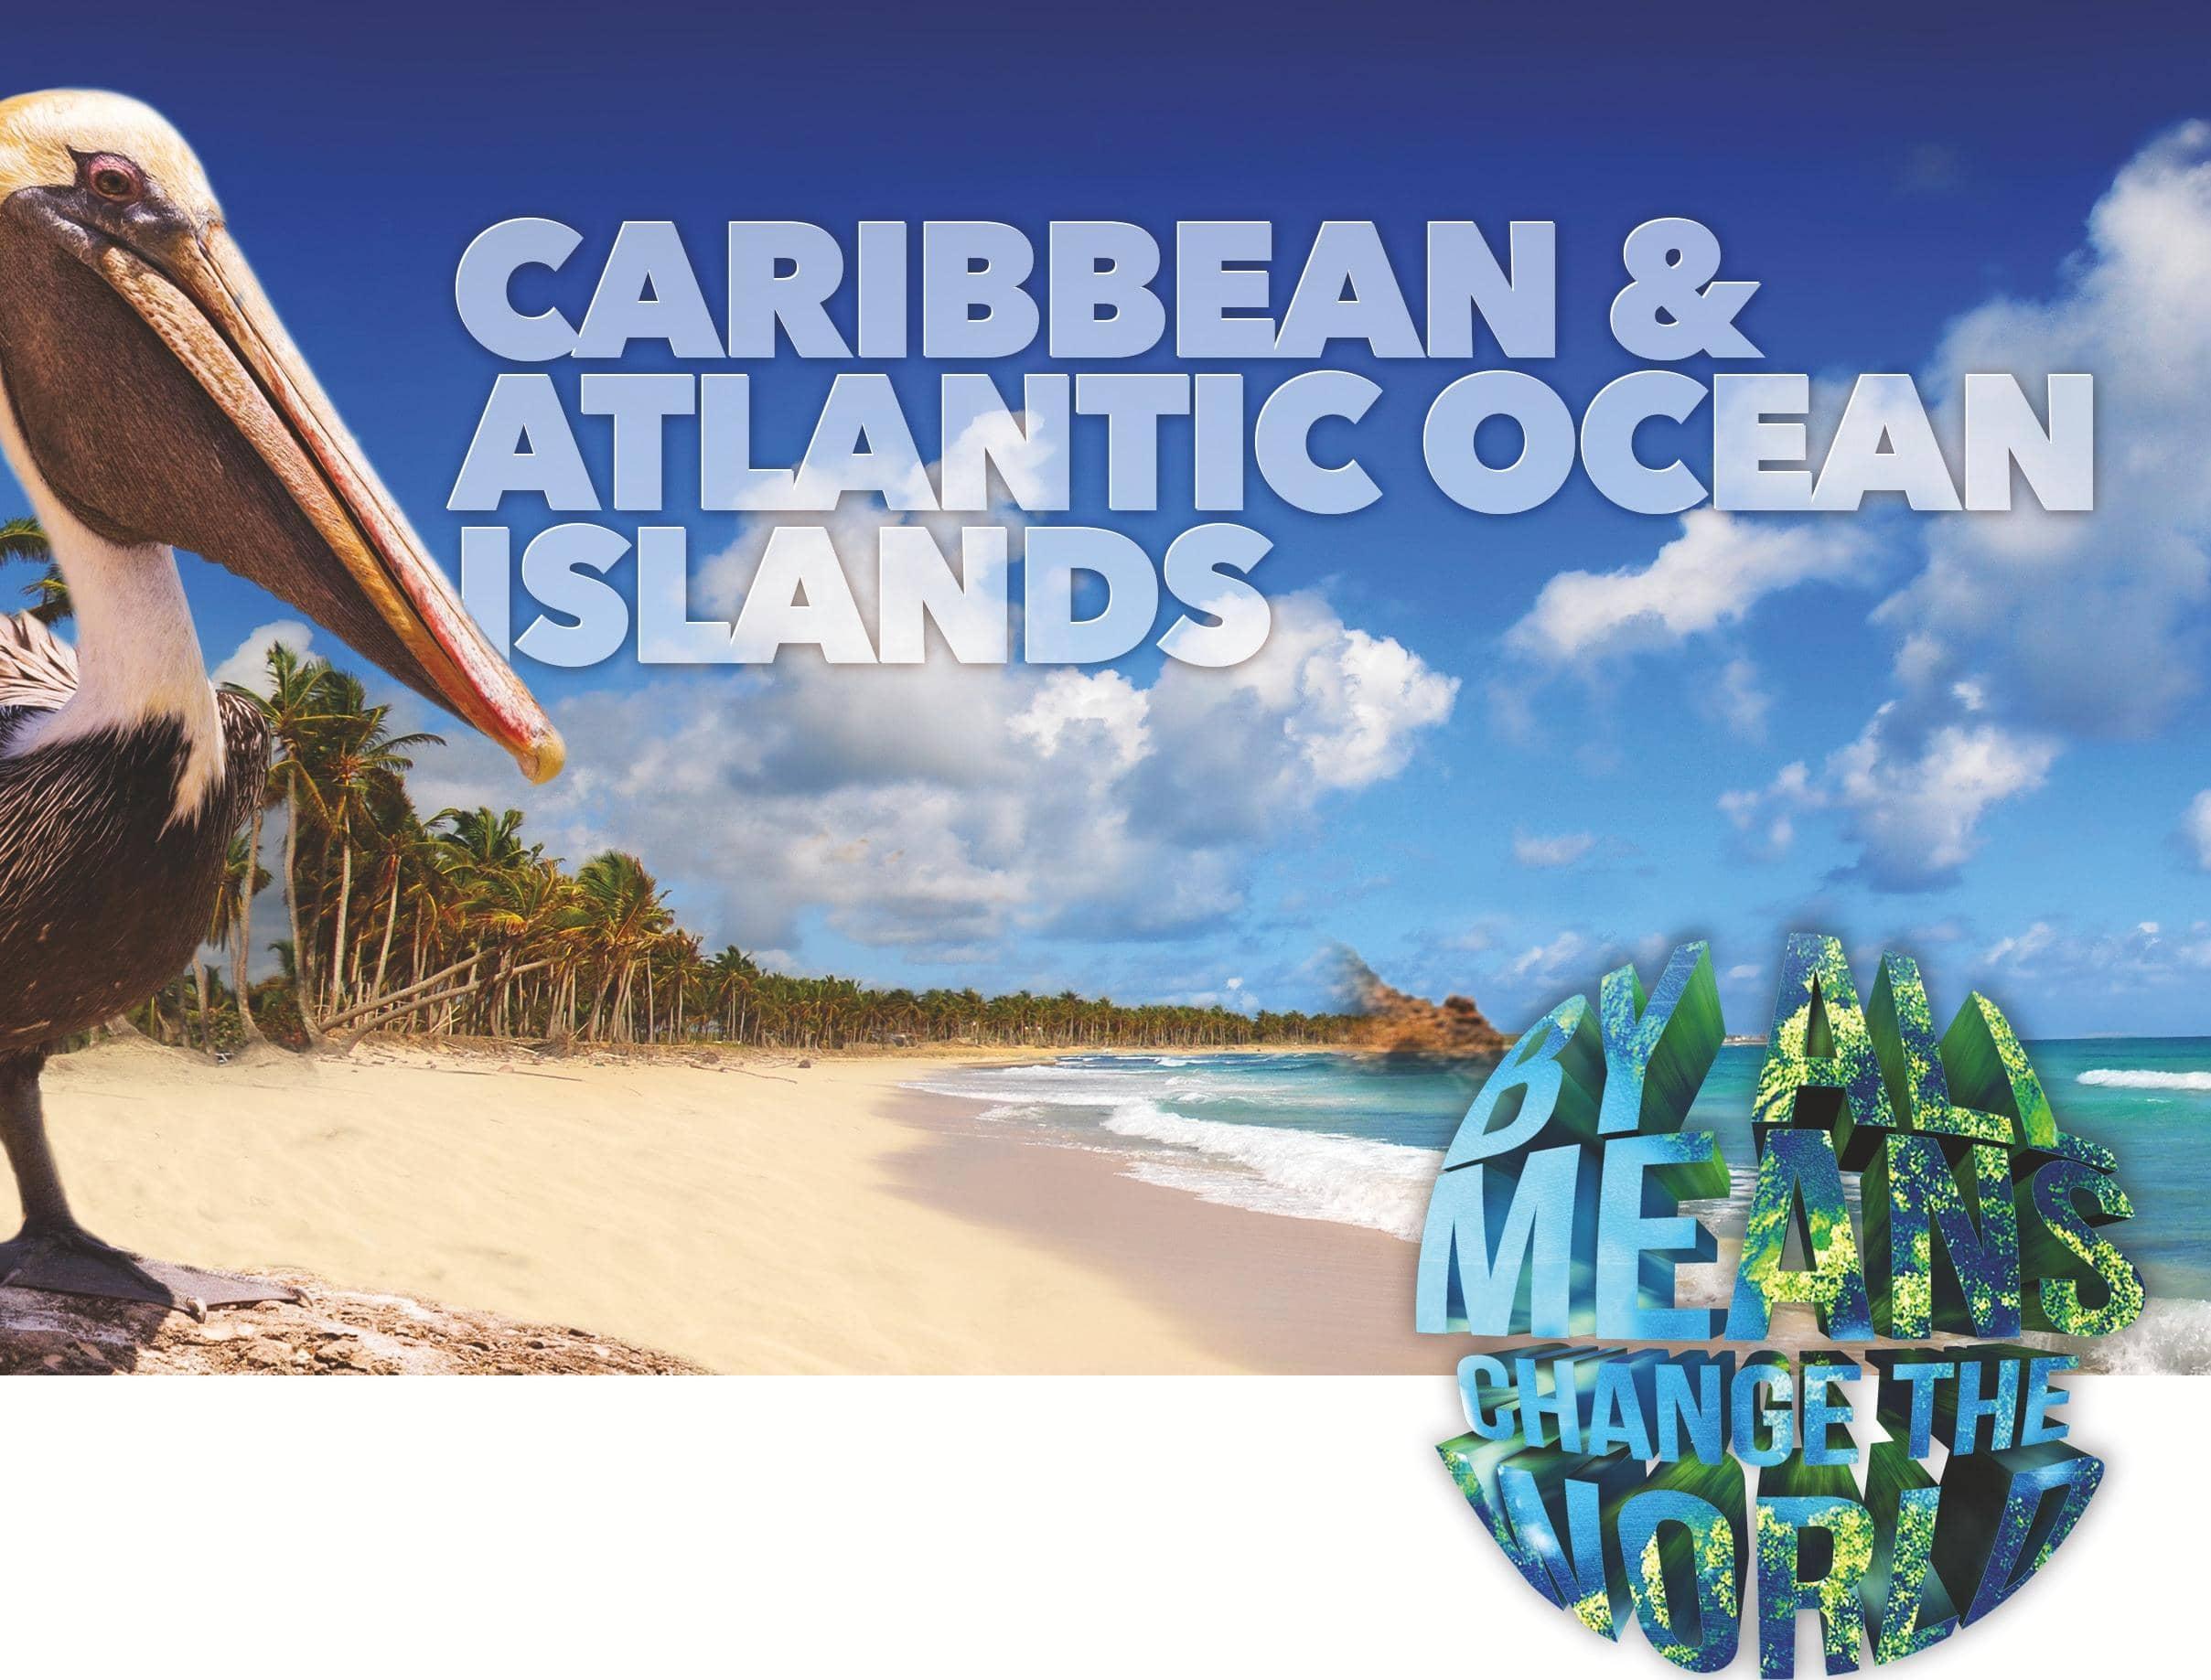 Caribbean & Atlantic Ocean Islands